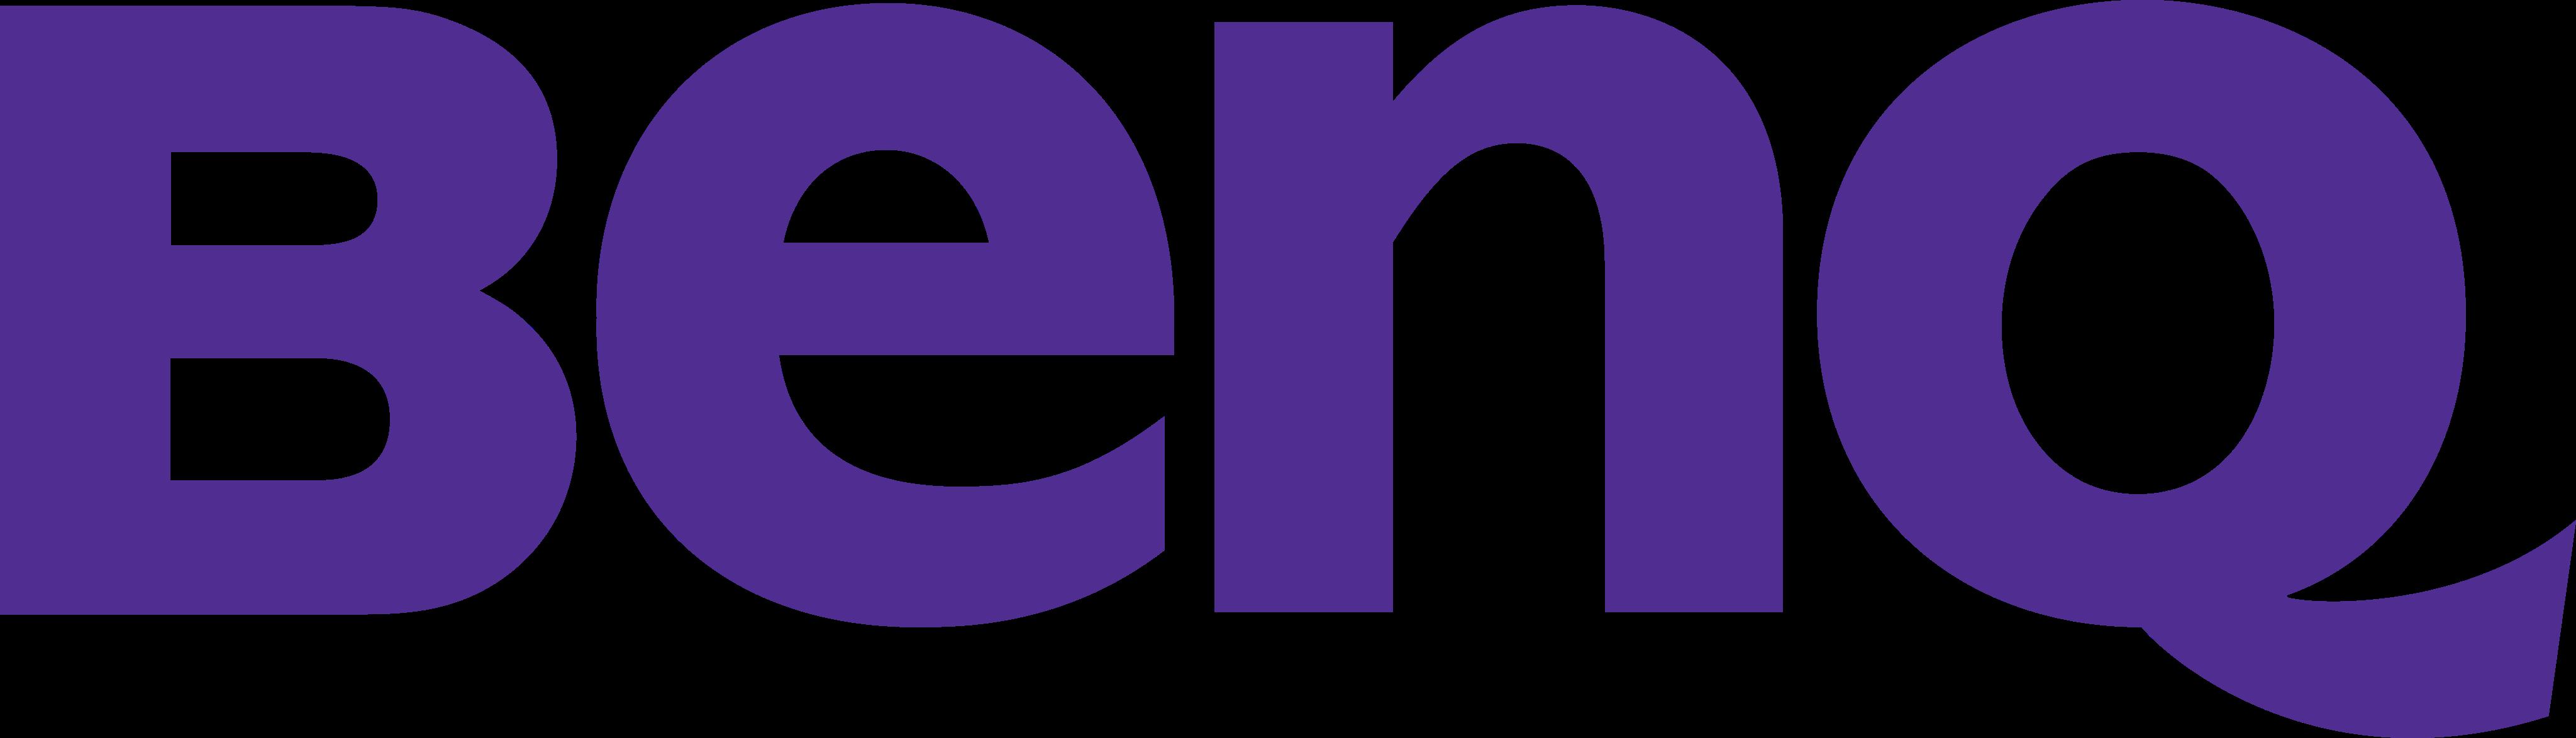 benq logo 1 - BenQ Logo